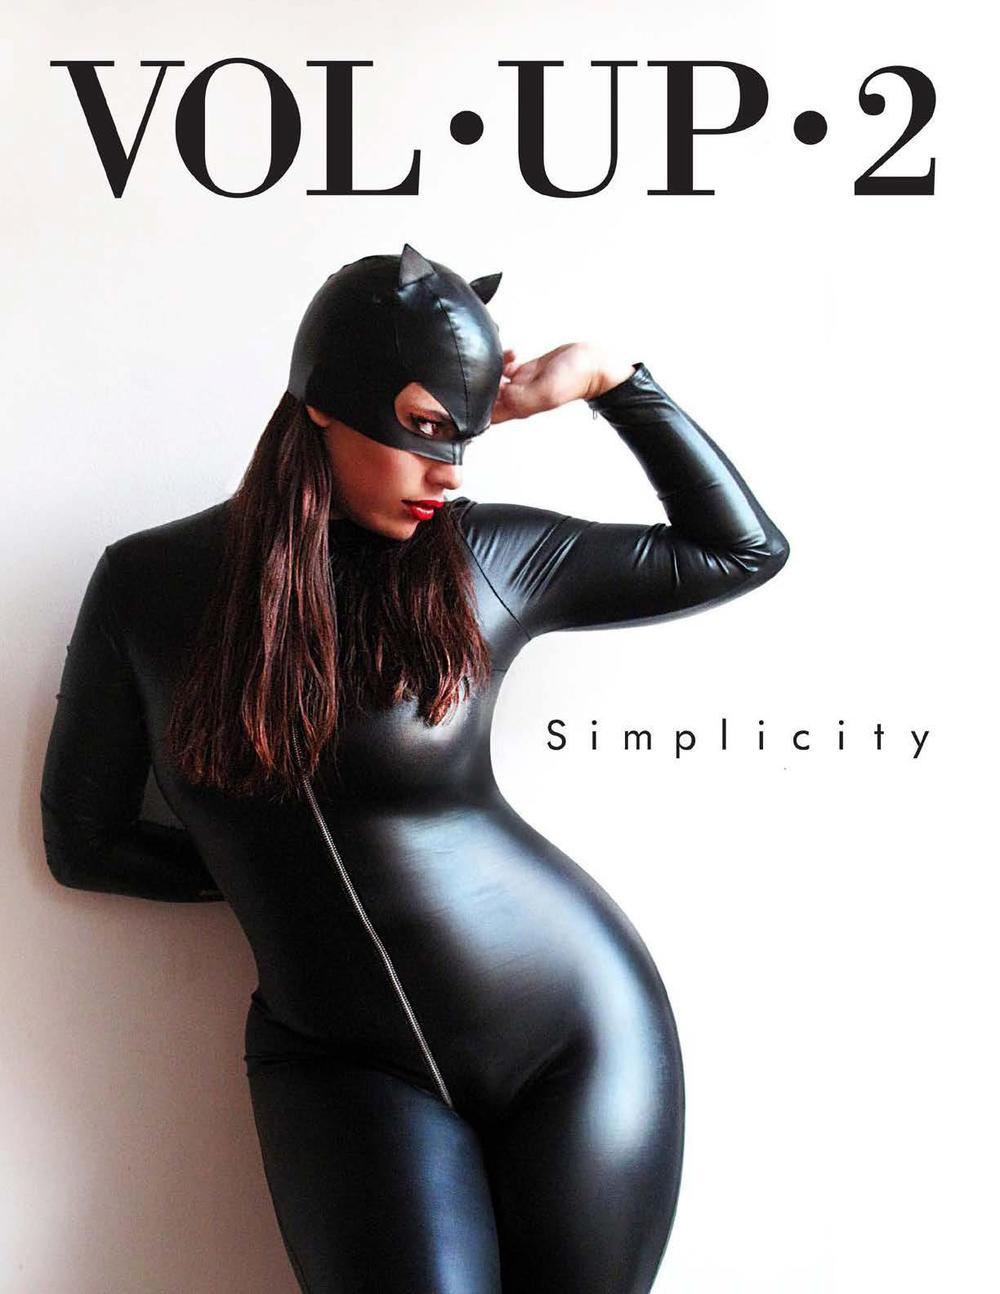 Volup2Simplicity.jpg